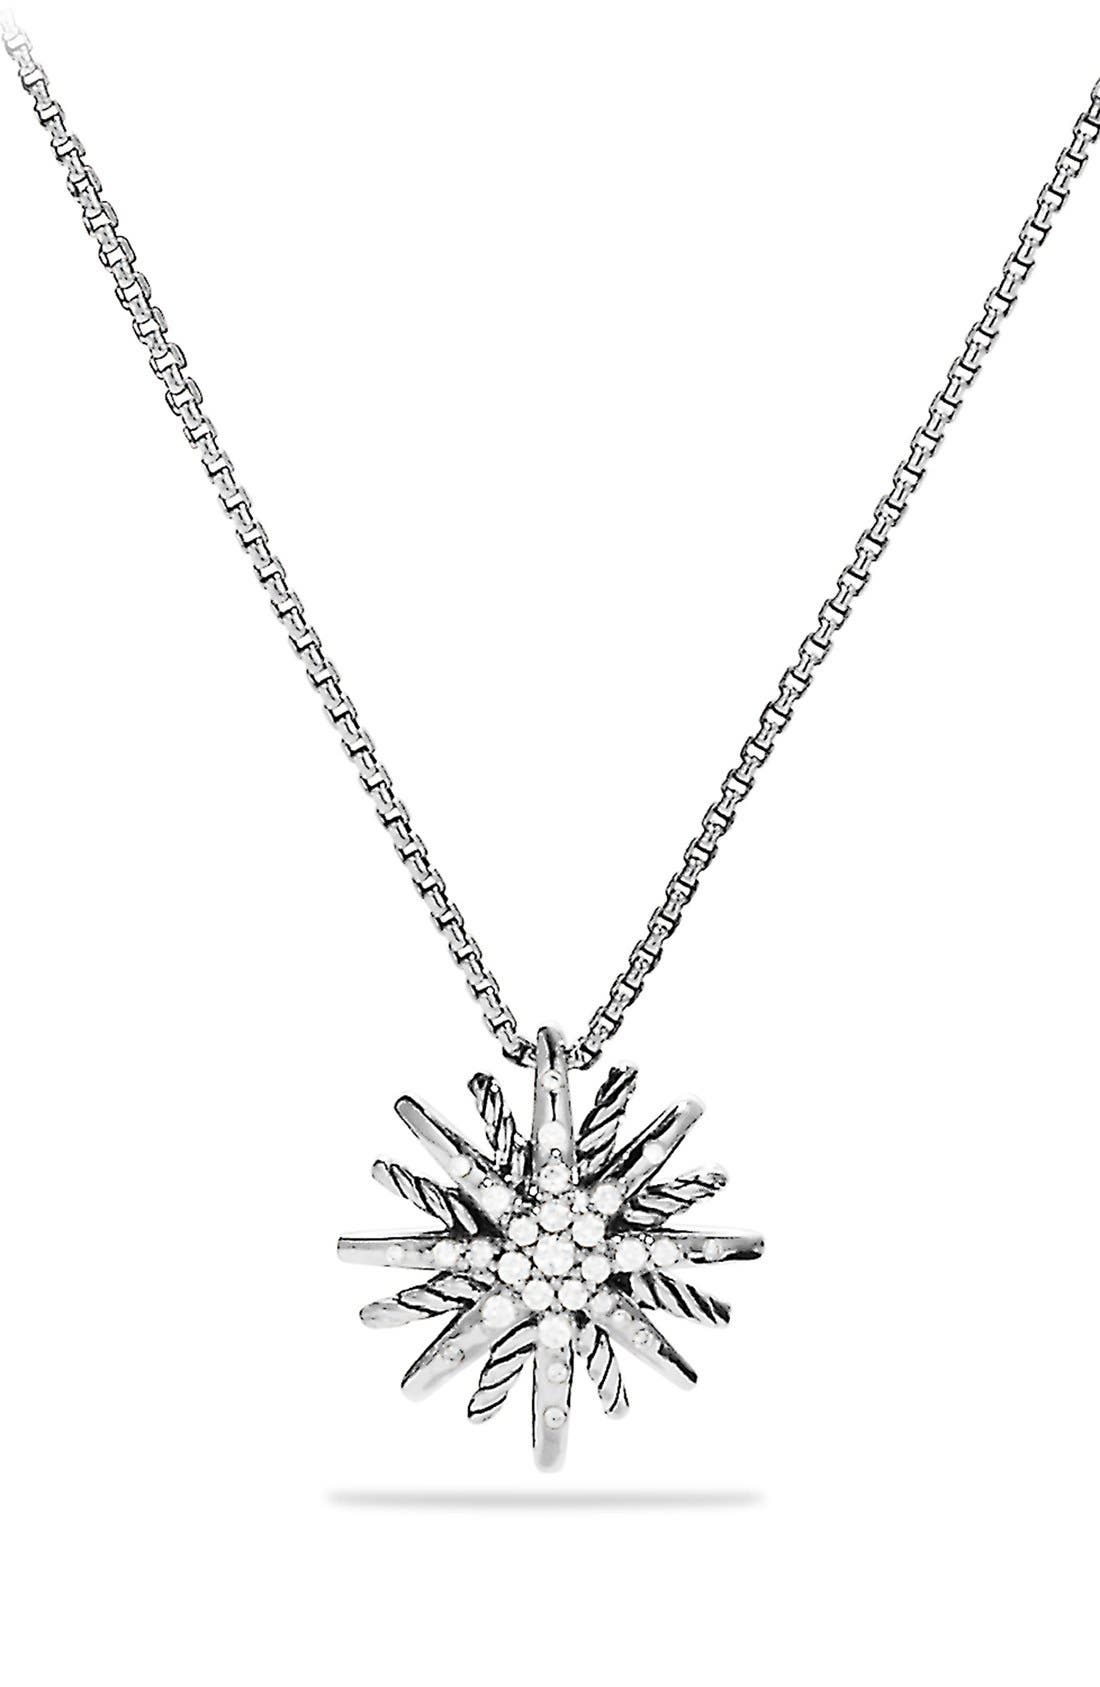 'Starburst' Small Pendant with Diamonds on Chain,                         Main,                         color, DIAMOND